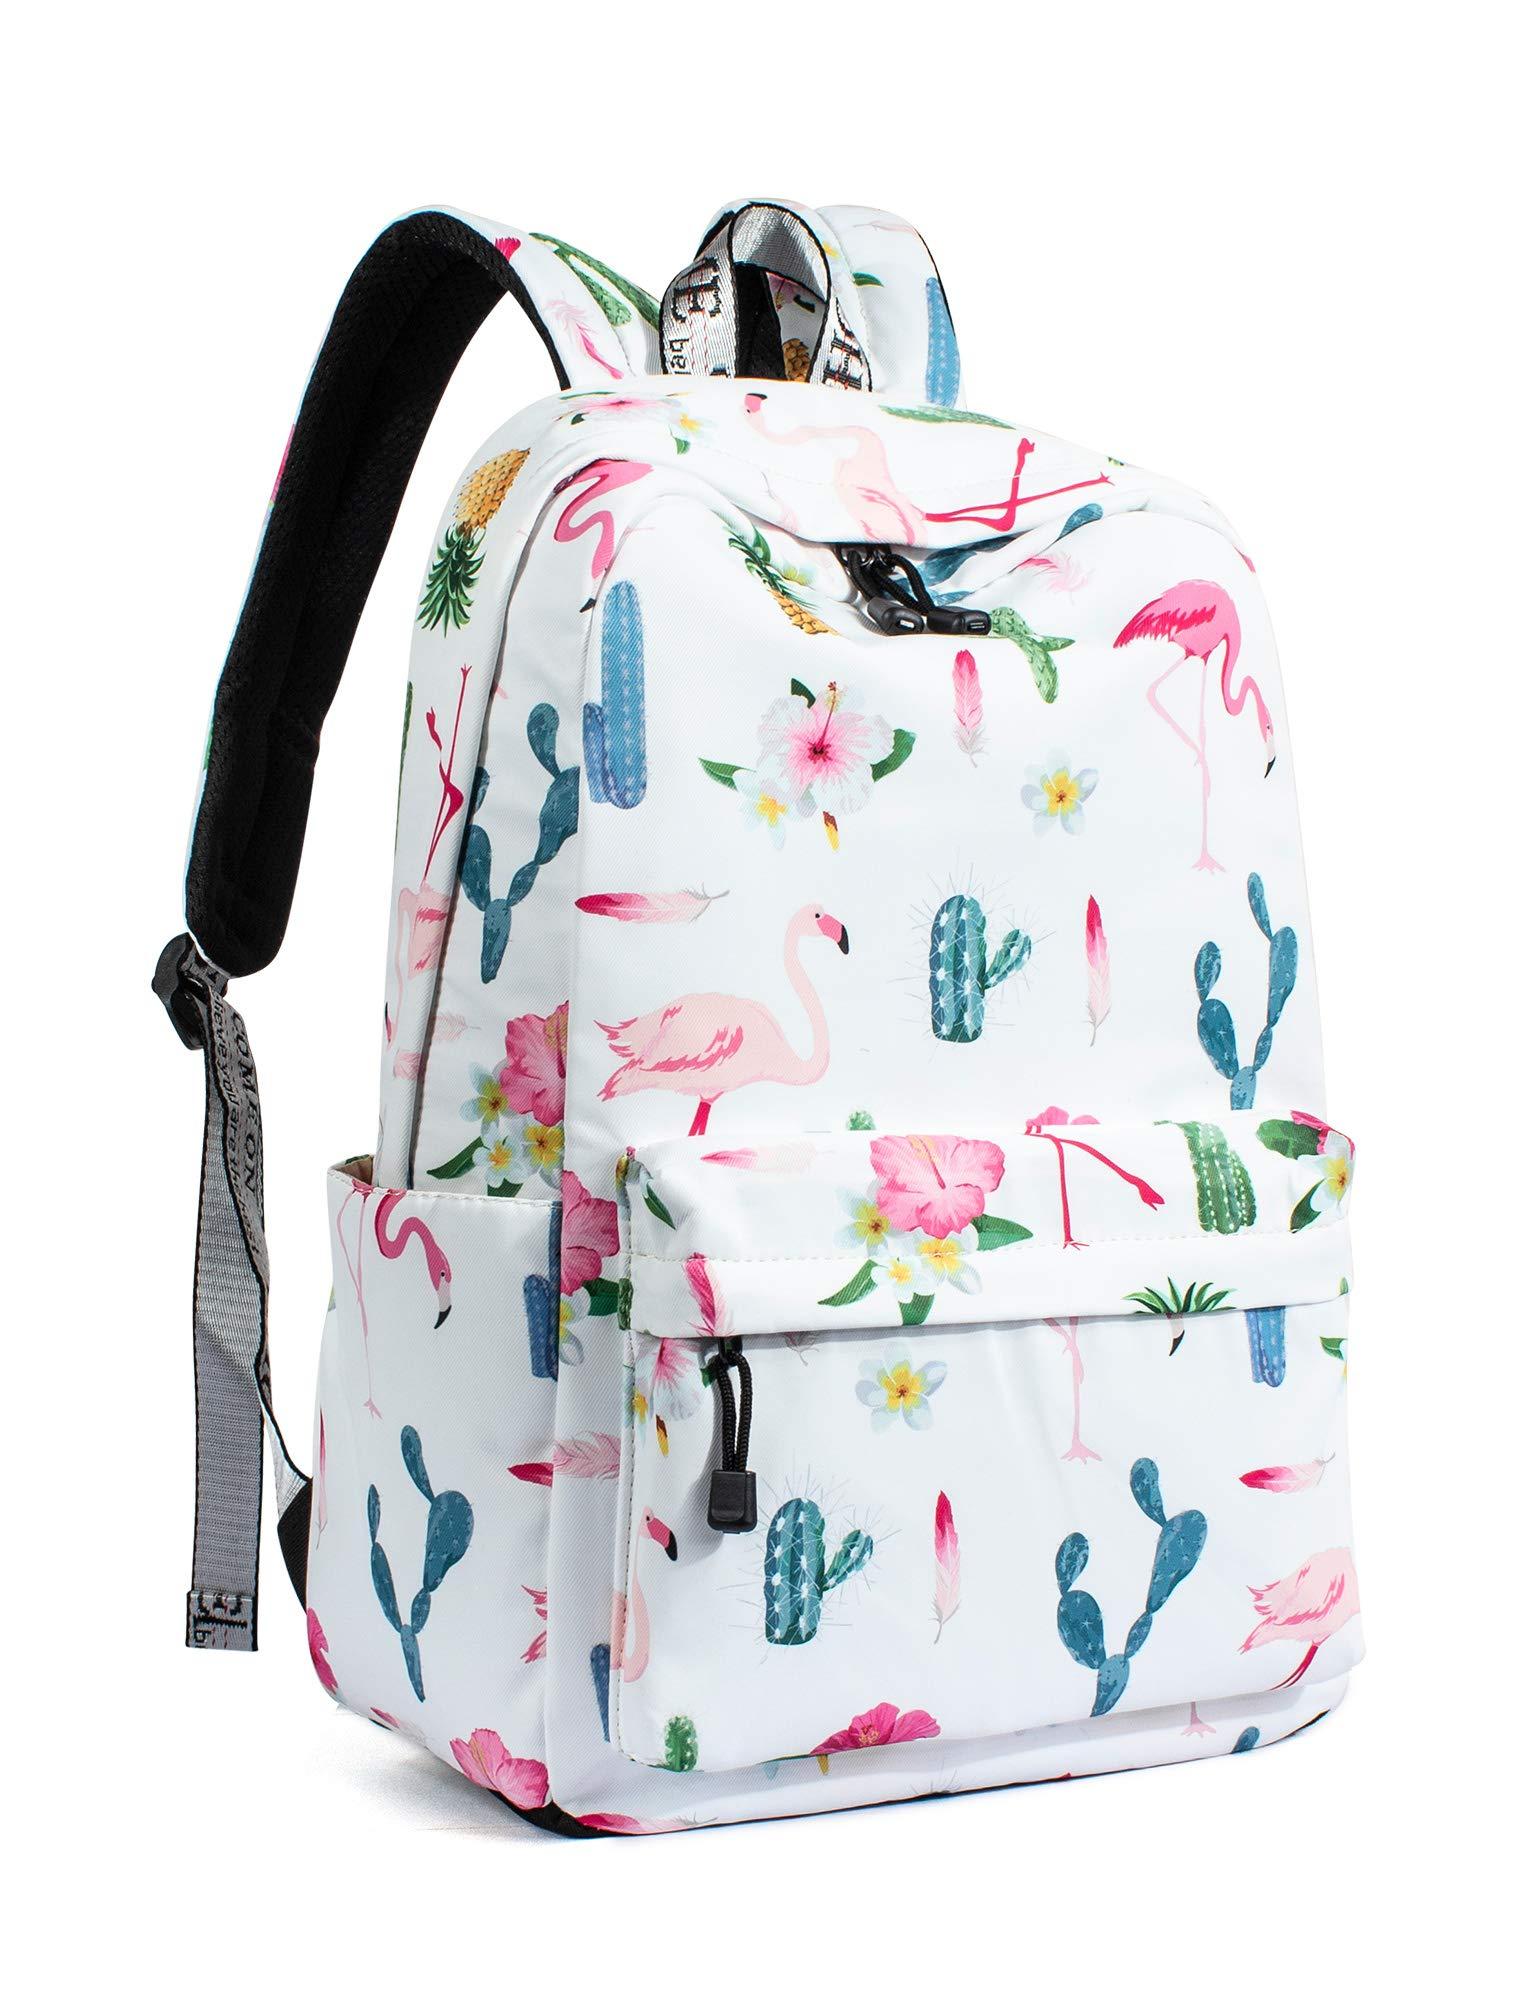 Leaper Cute Flamingo School Backpack Girls Travel Bag Laptop Bag White [9110]